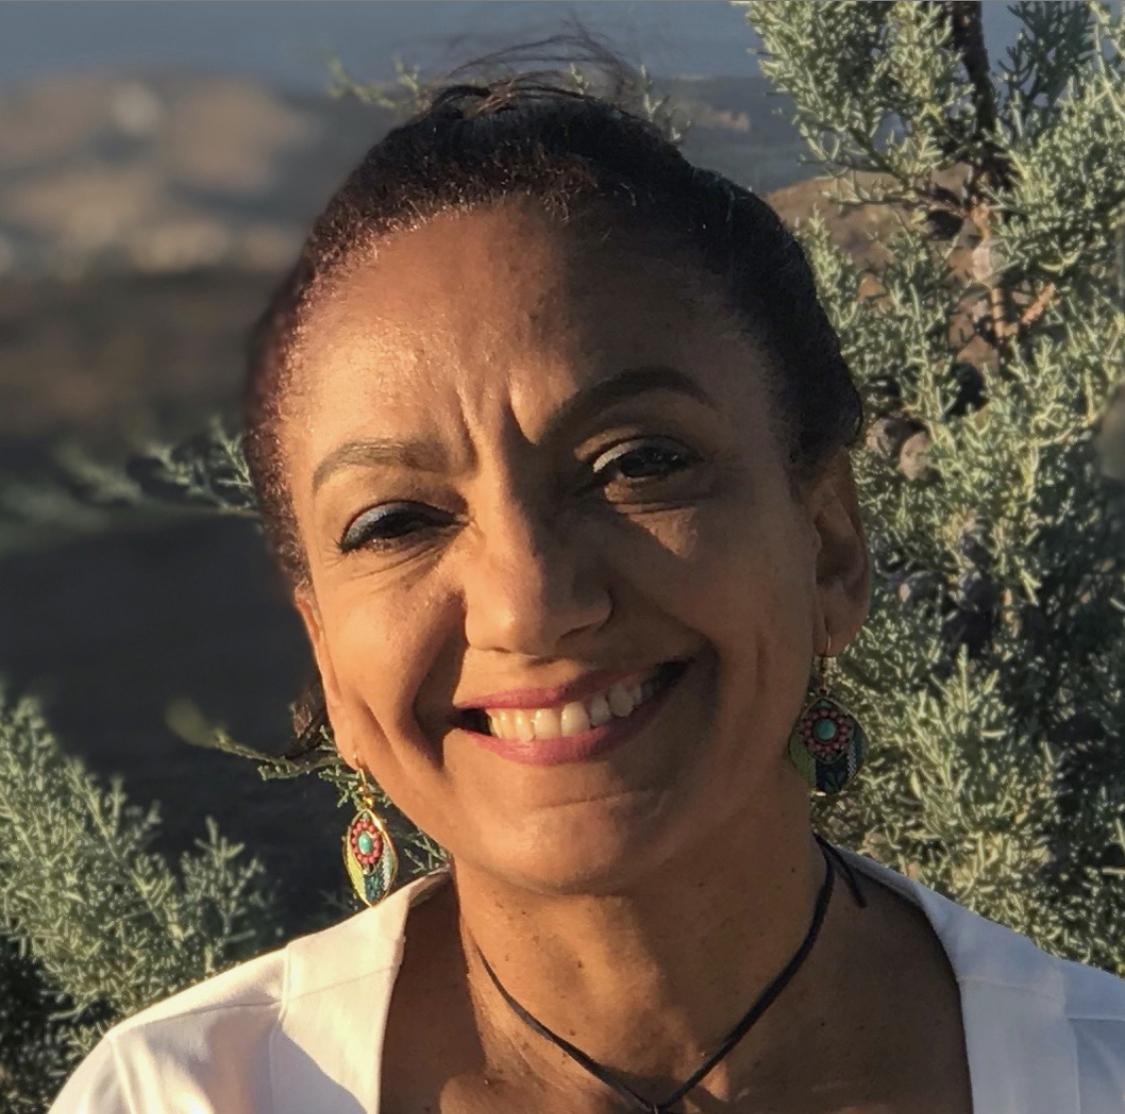 Fabiola Fuentes